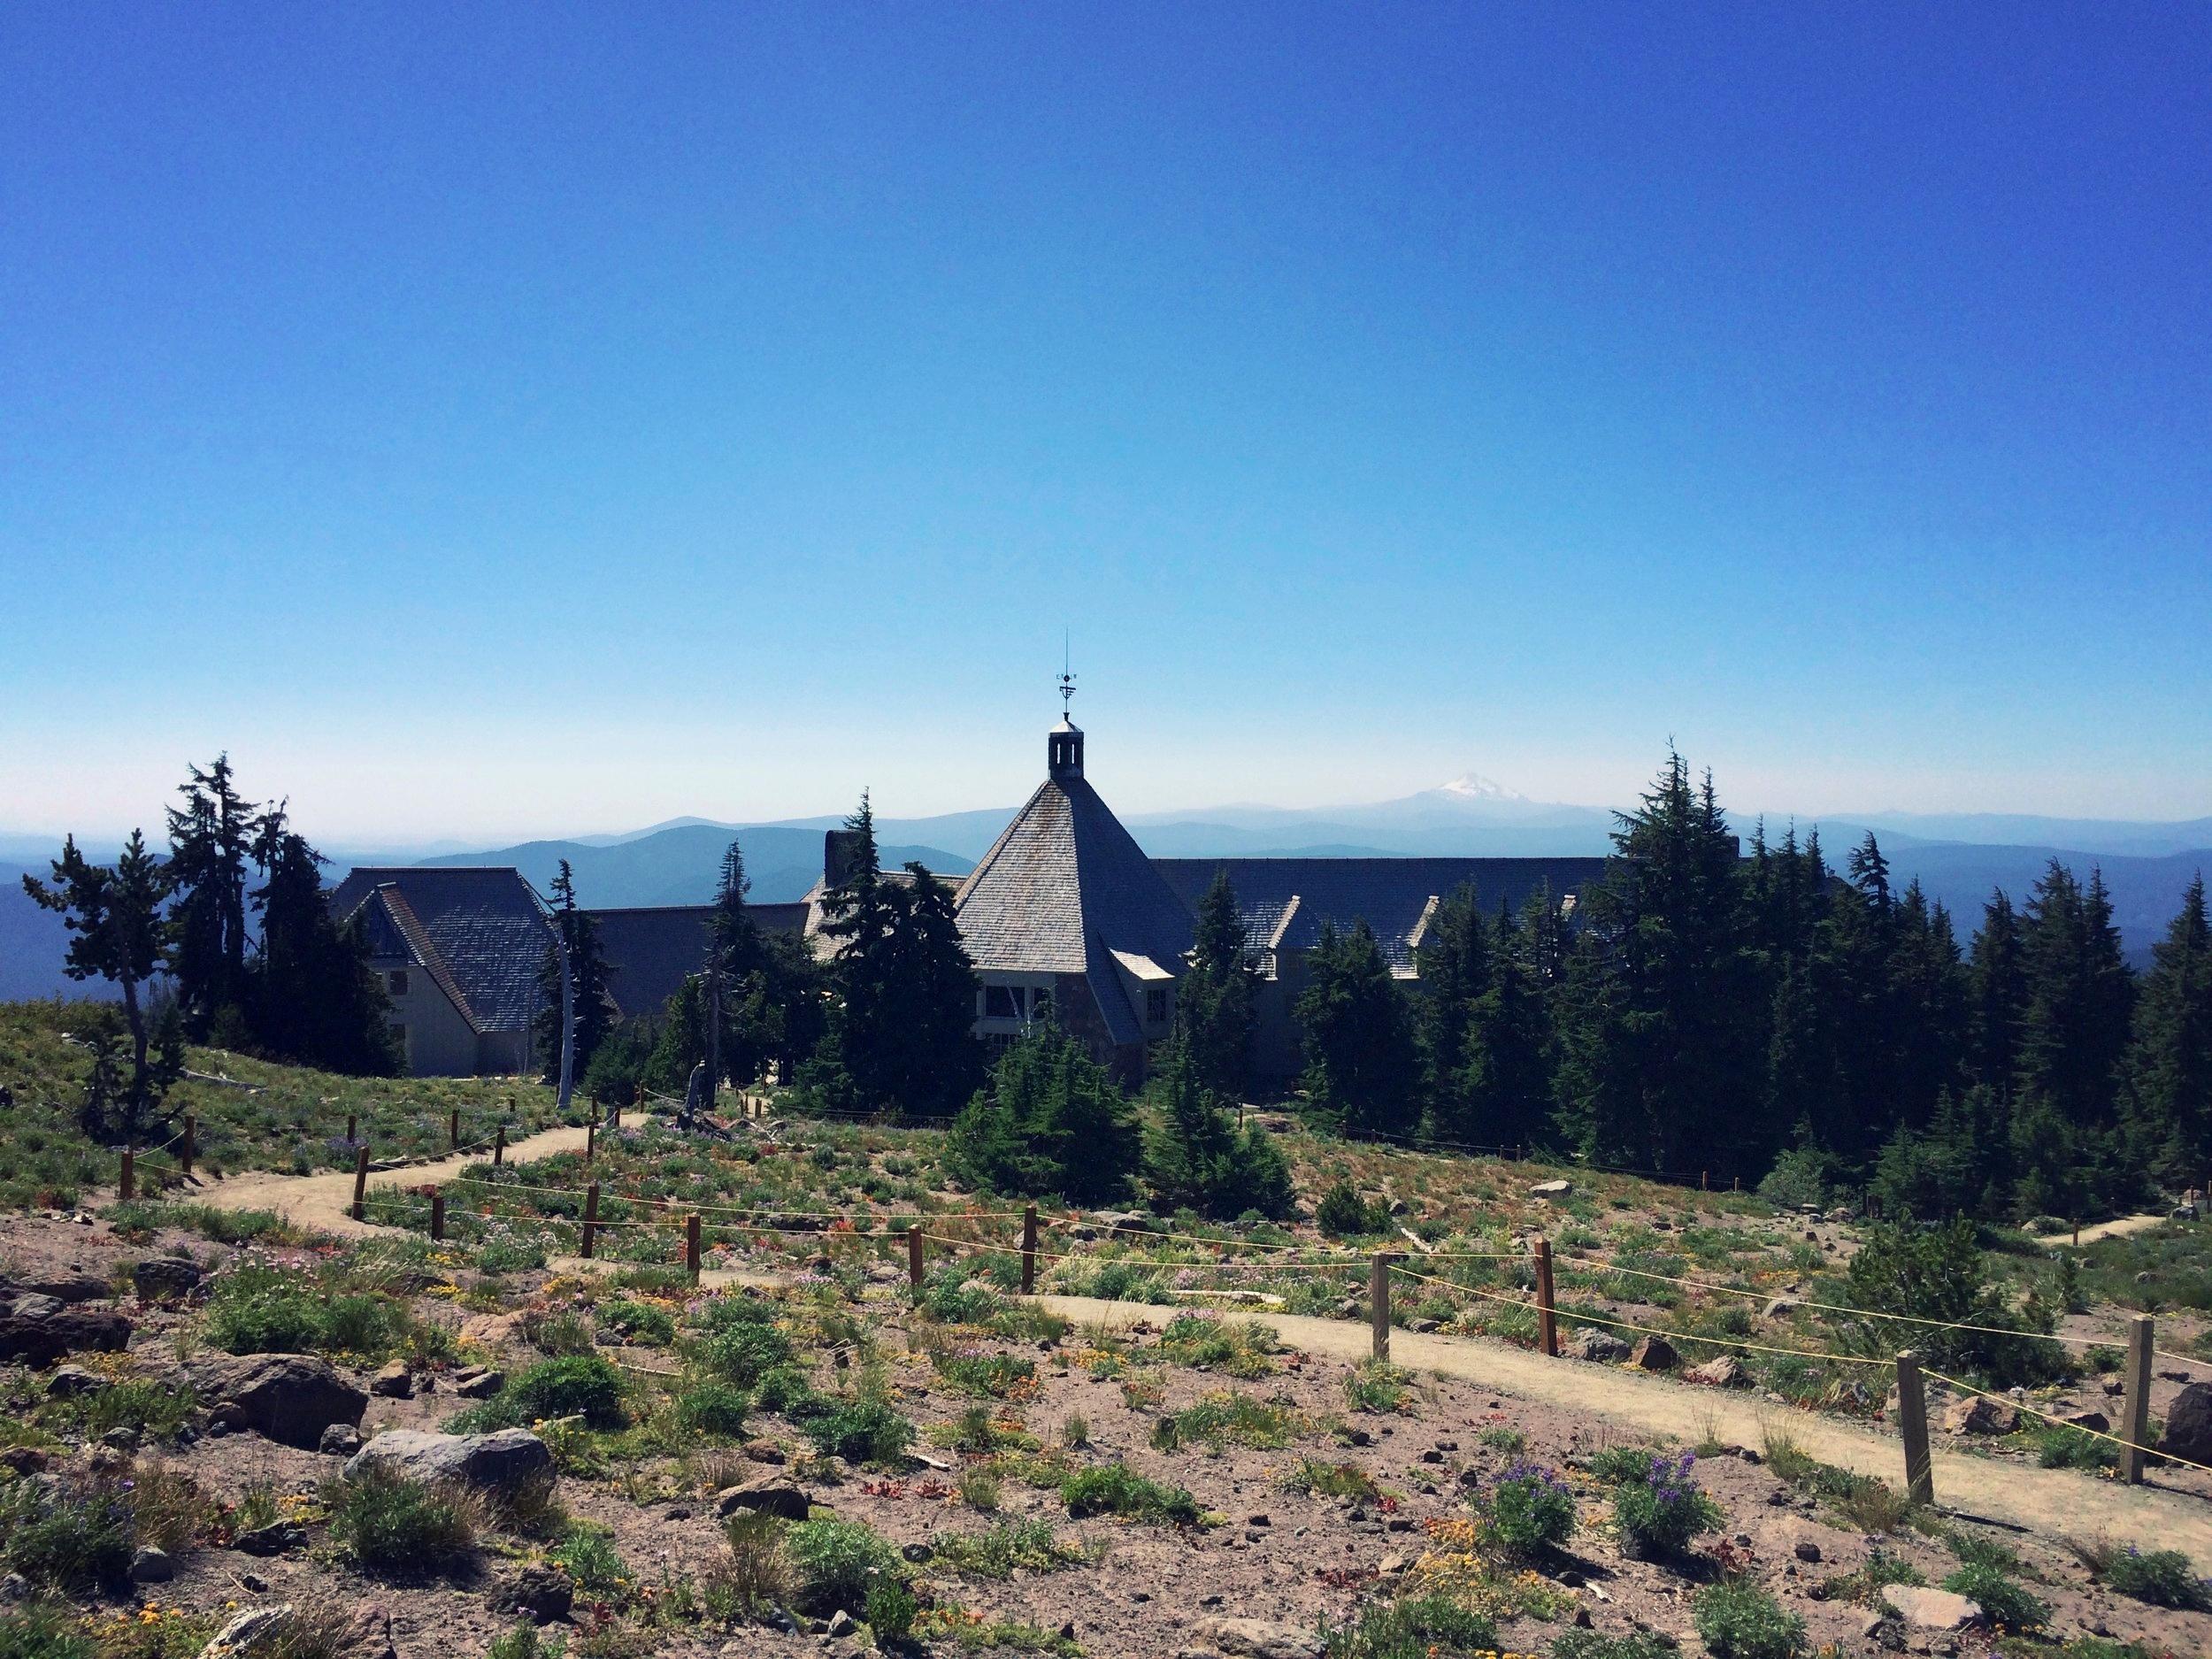 Timberline Lodge - Mount Hood, OR